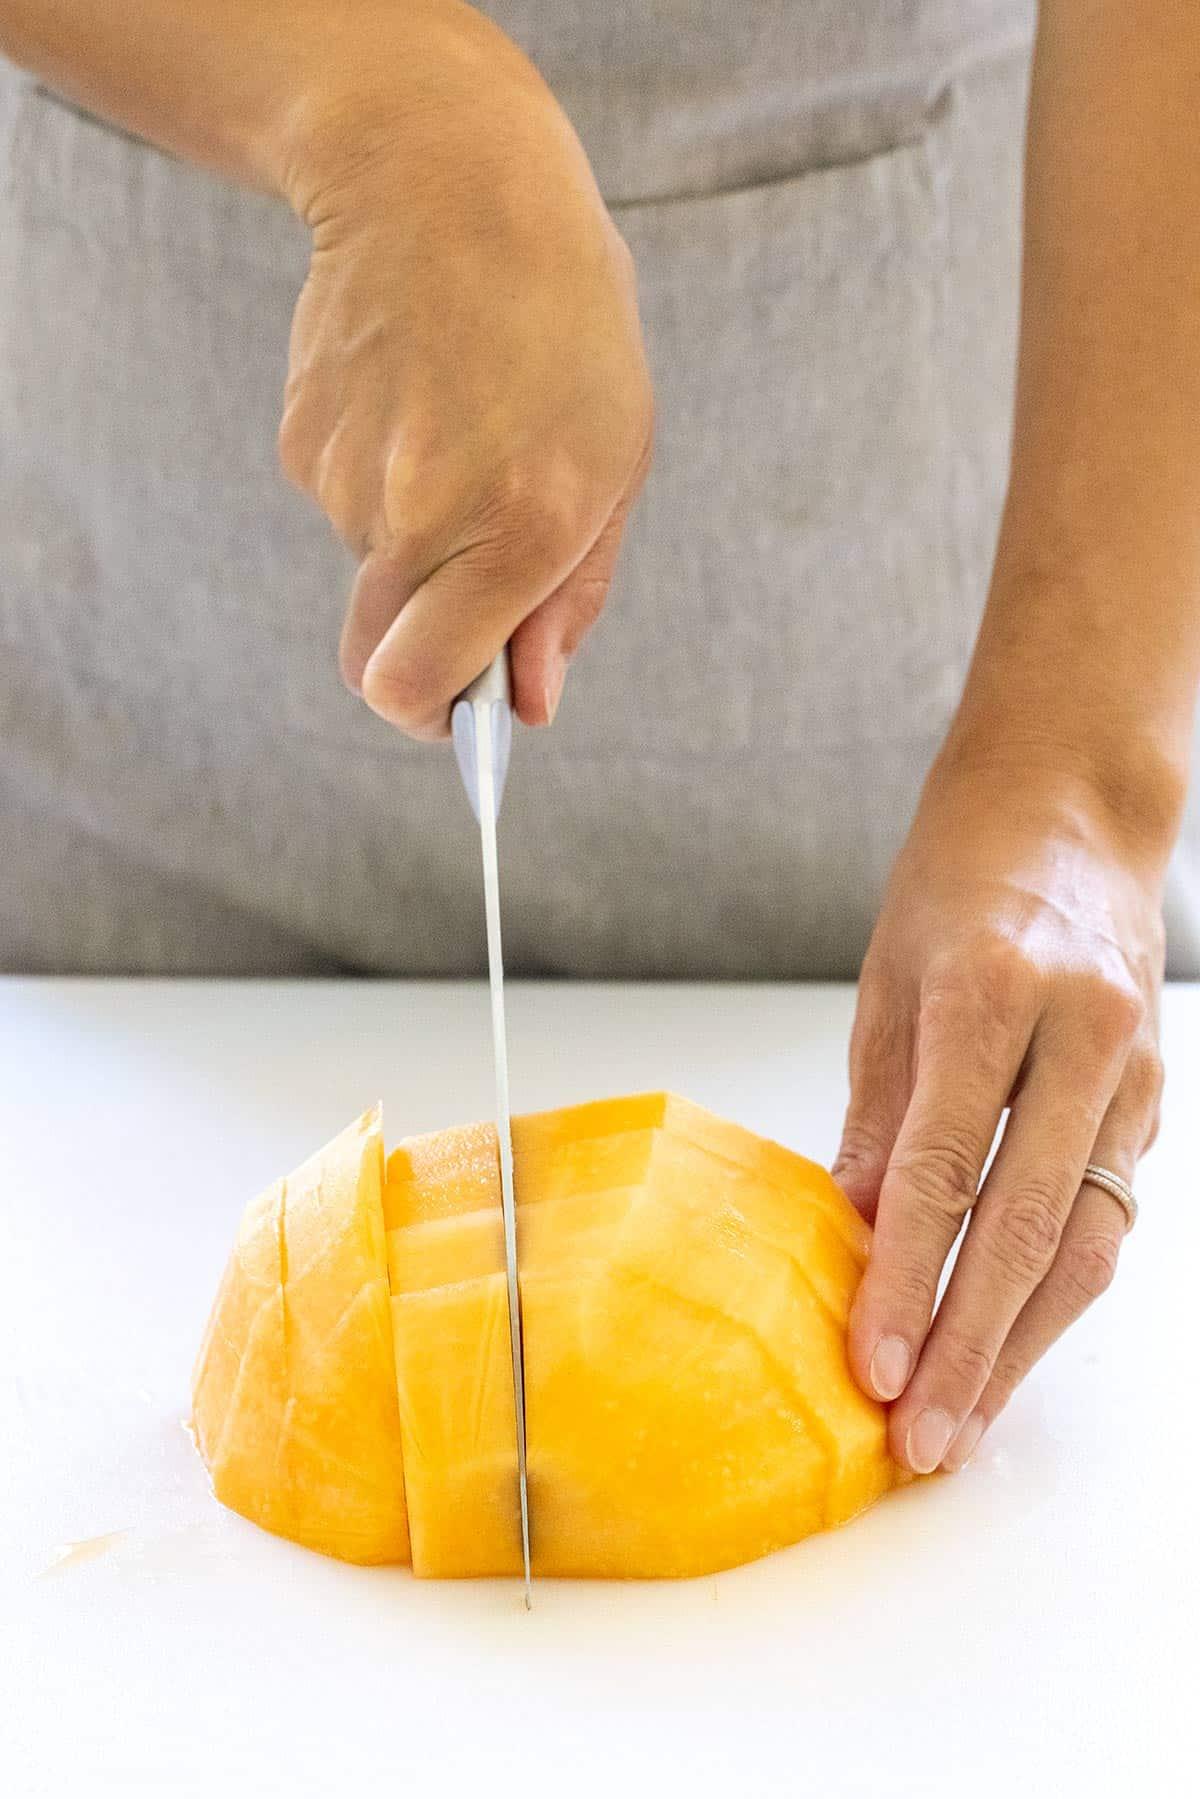 cutting a melon into cubes